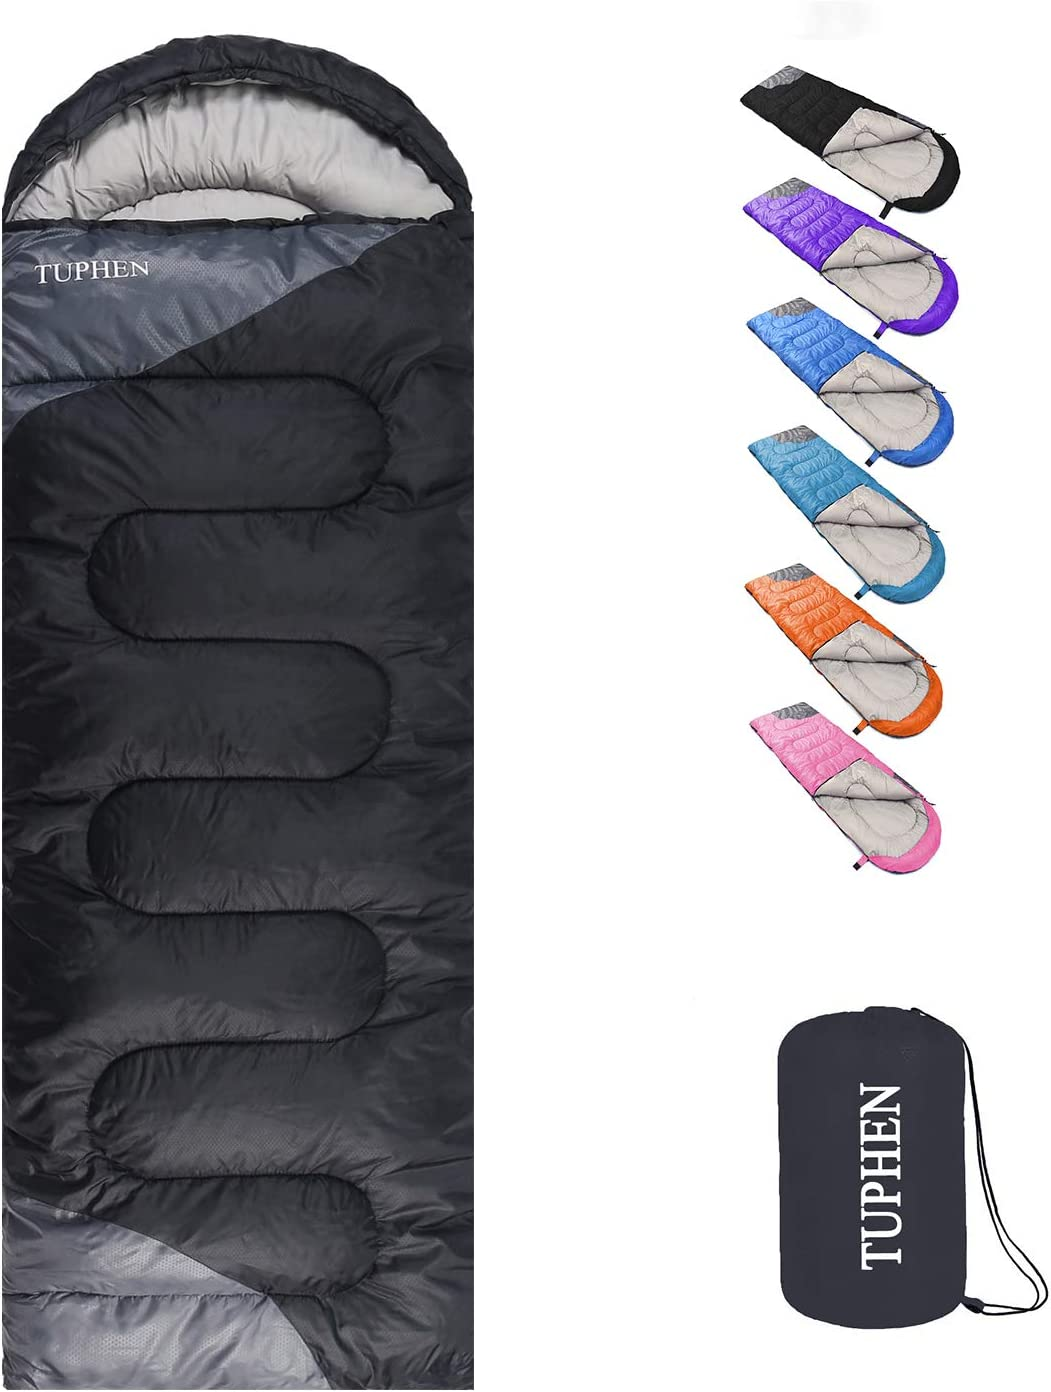 Black and dark gray Tuphen sleeping bag unpacked and packed away